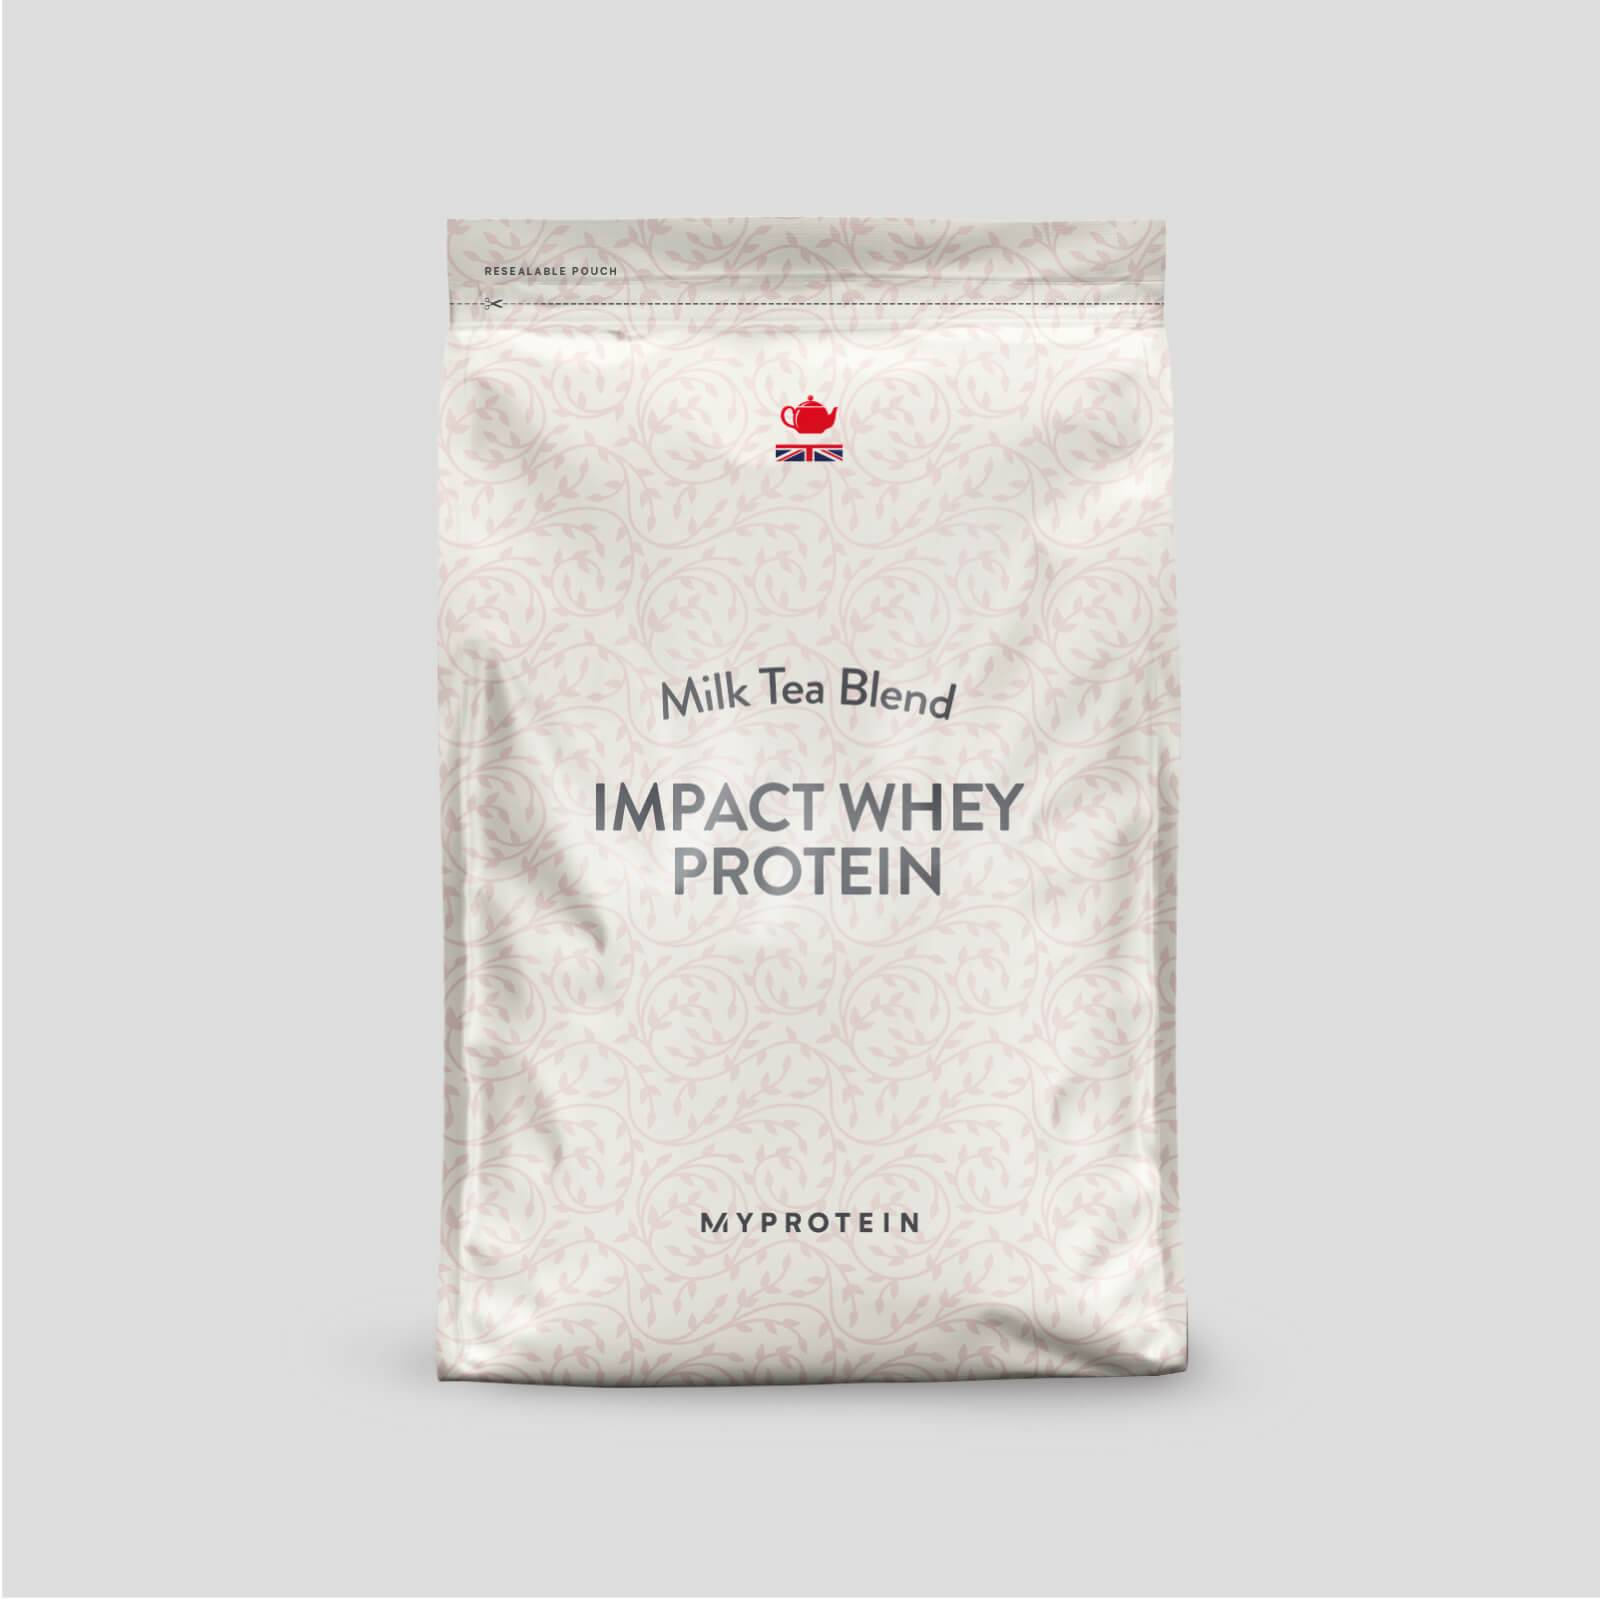 Myprotein Impact Whey Protein - Thé au Lait - 5kg - Milk Tea